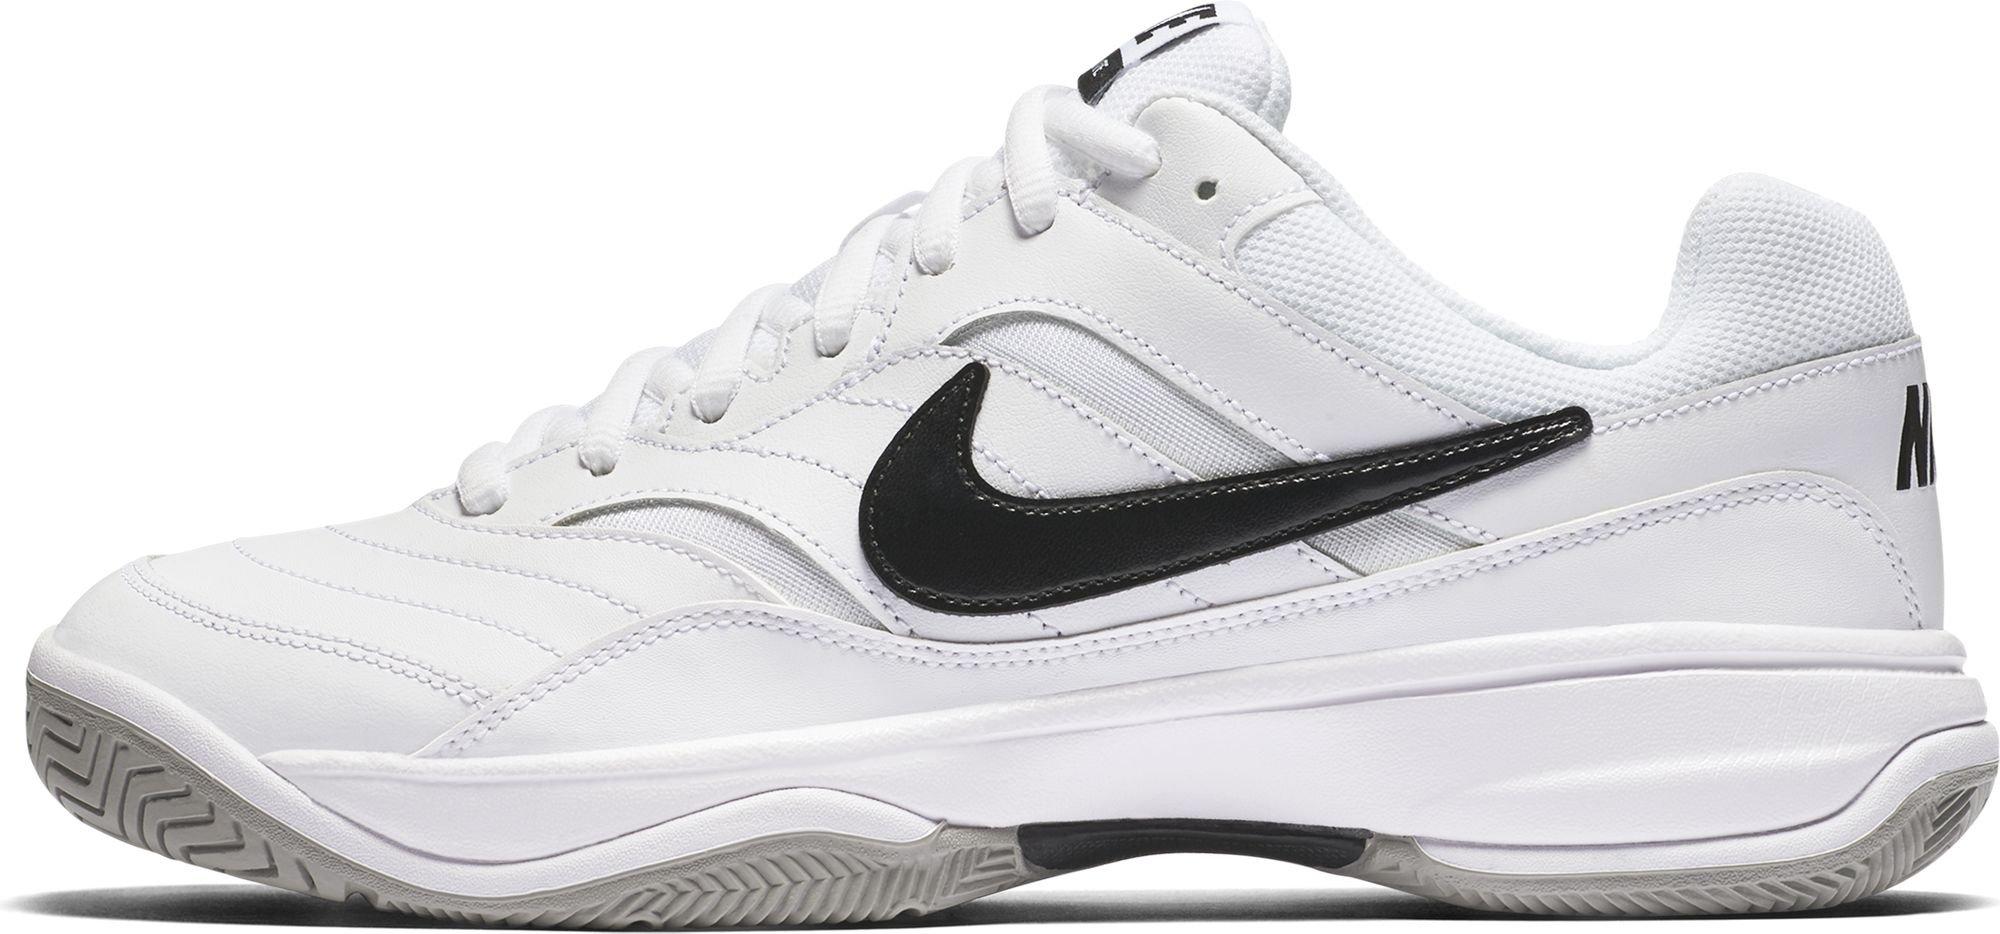 NIKE Men's Court Lite Tennis Shoe, White/Medium Grey/Black, 7 D(M) US